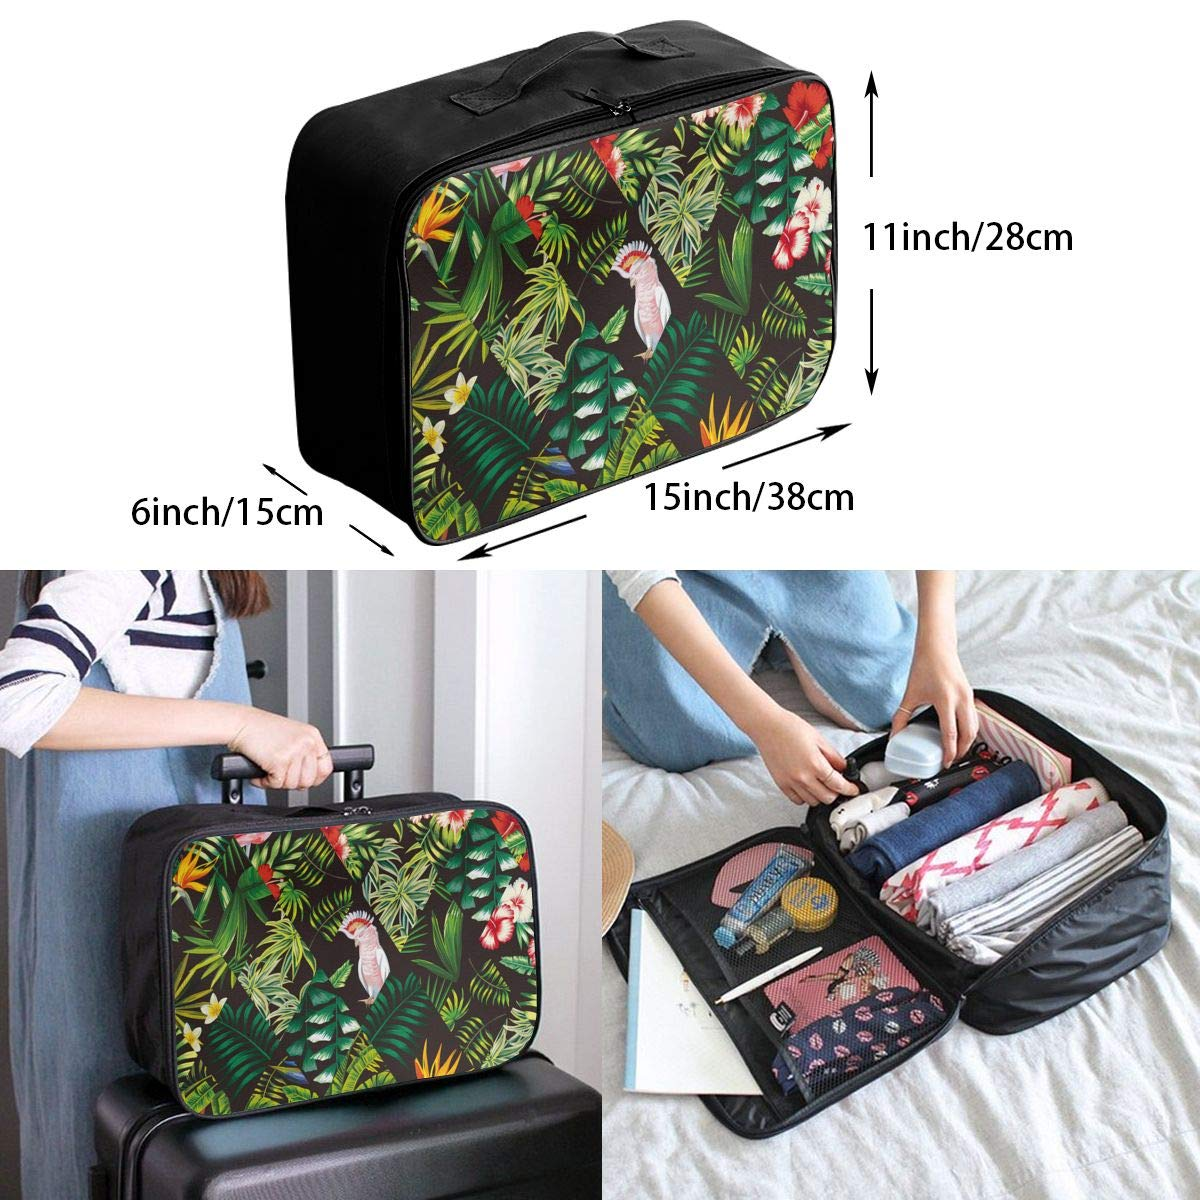 Women /& Men Foldable Travel Duffel Bag Parrot Pink Flamingo Palm Leaf For Luggage Gym Sports